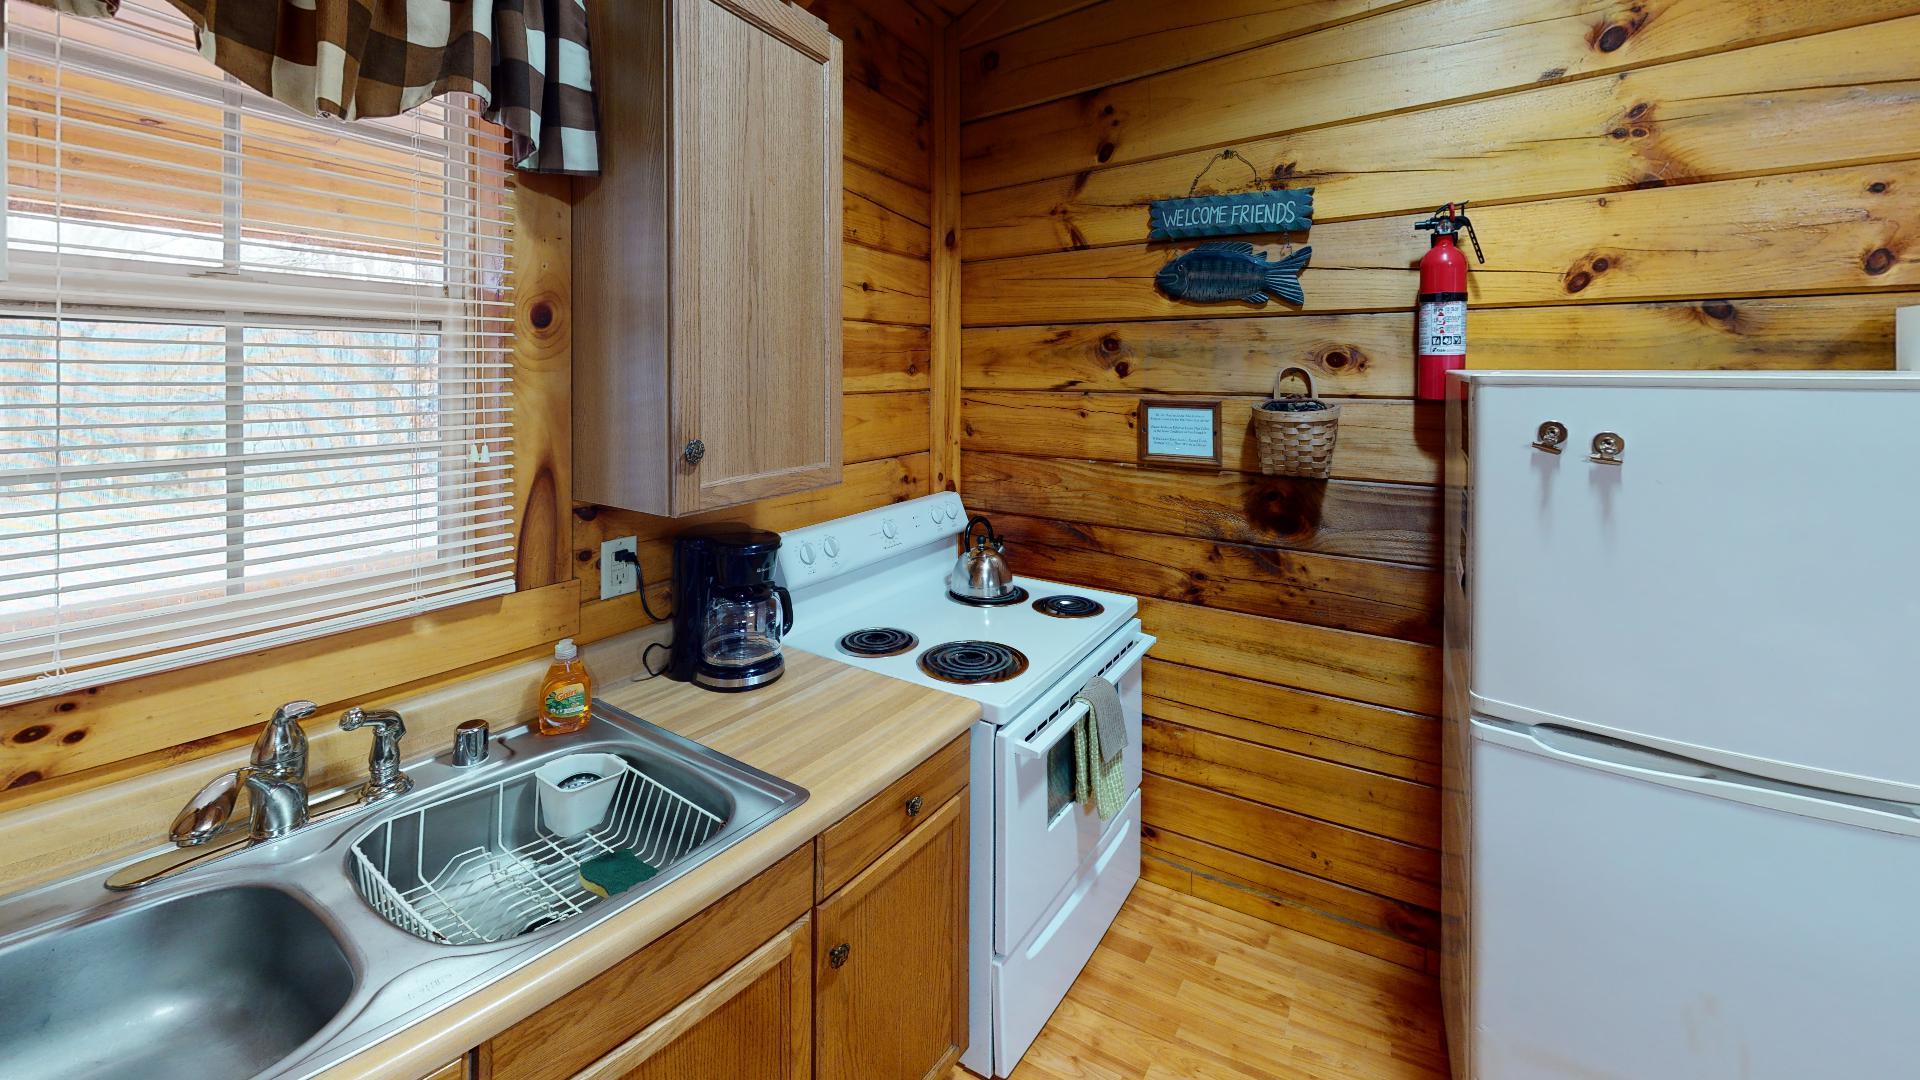 The Landing Kitchen - Kitchen area.